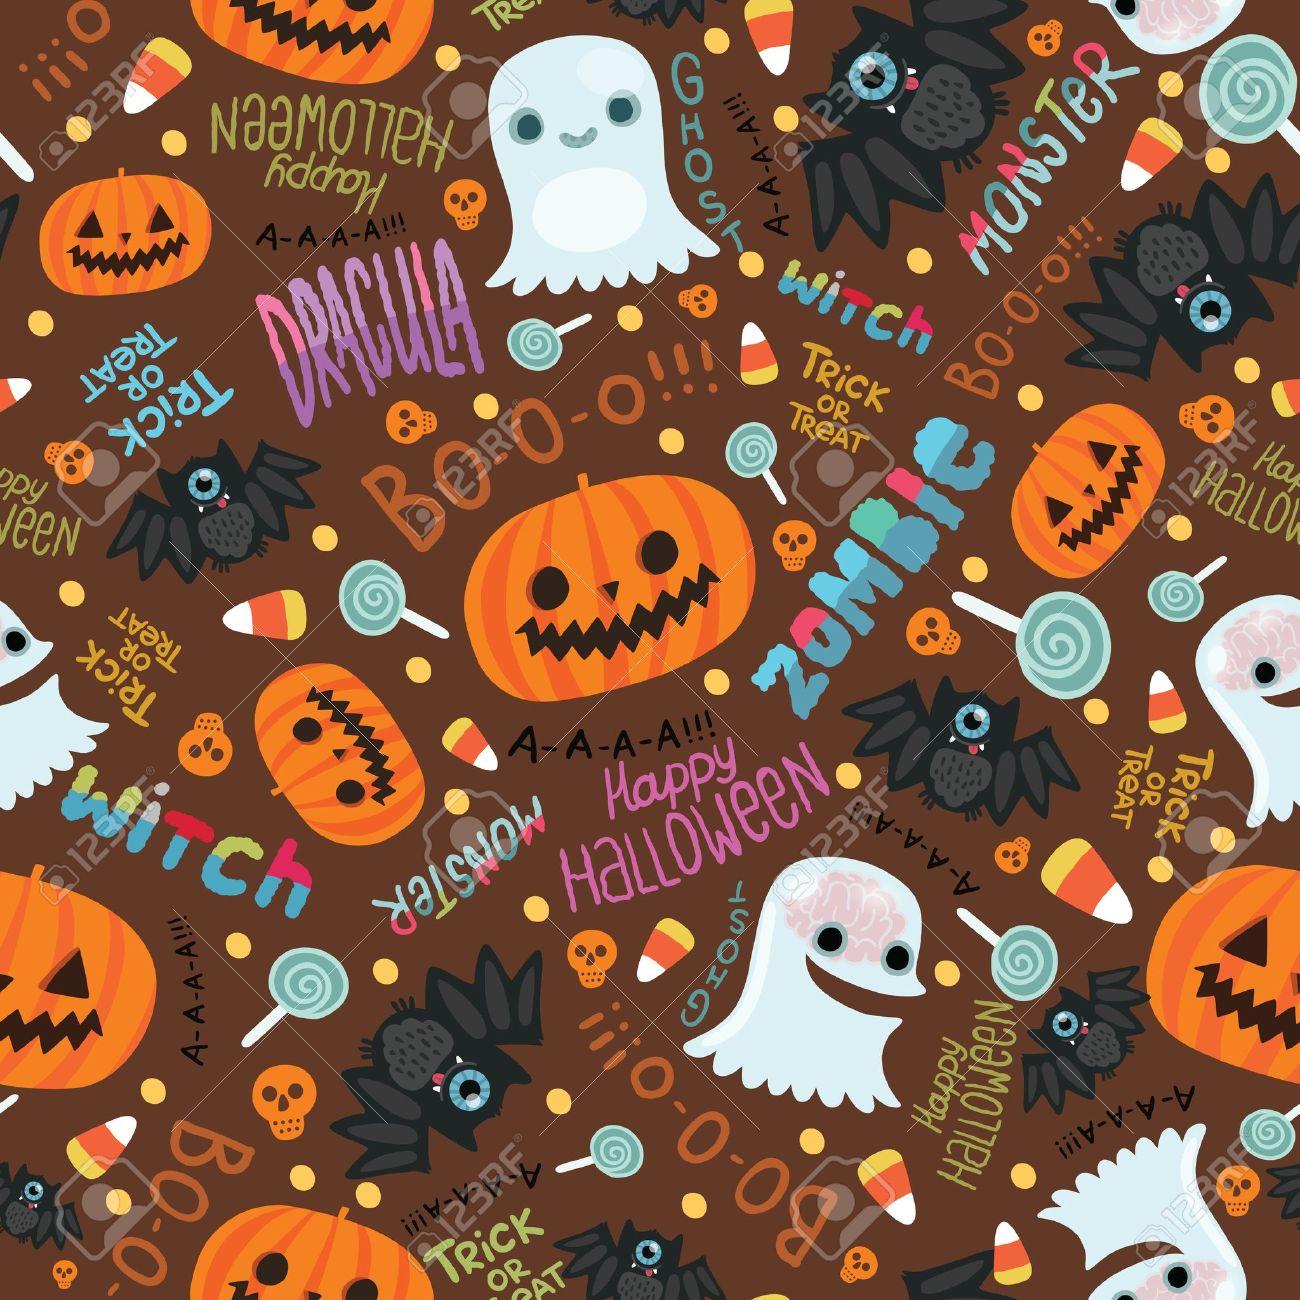 Halloween Pattern Wallpaper.Cute Halloween Pattern Background 1300x1300 Download Hd Wallpaper Wallpapertip